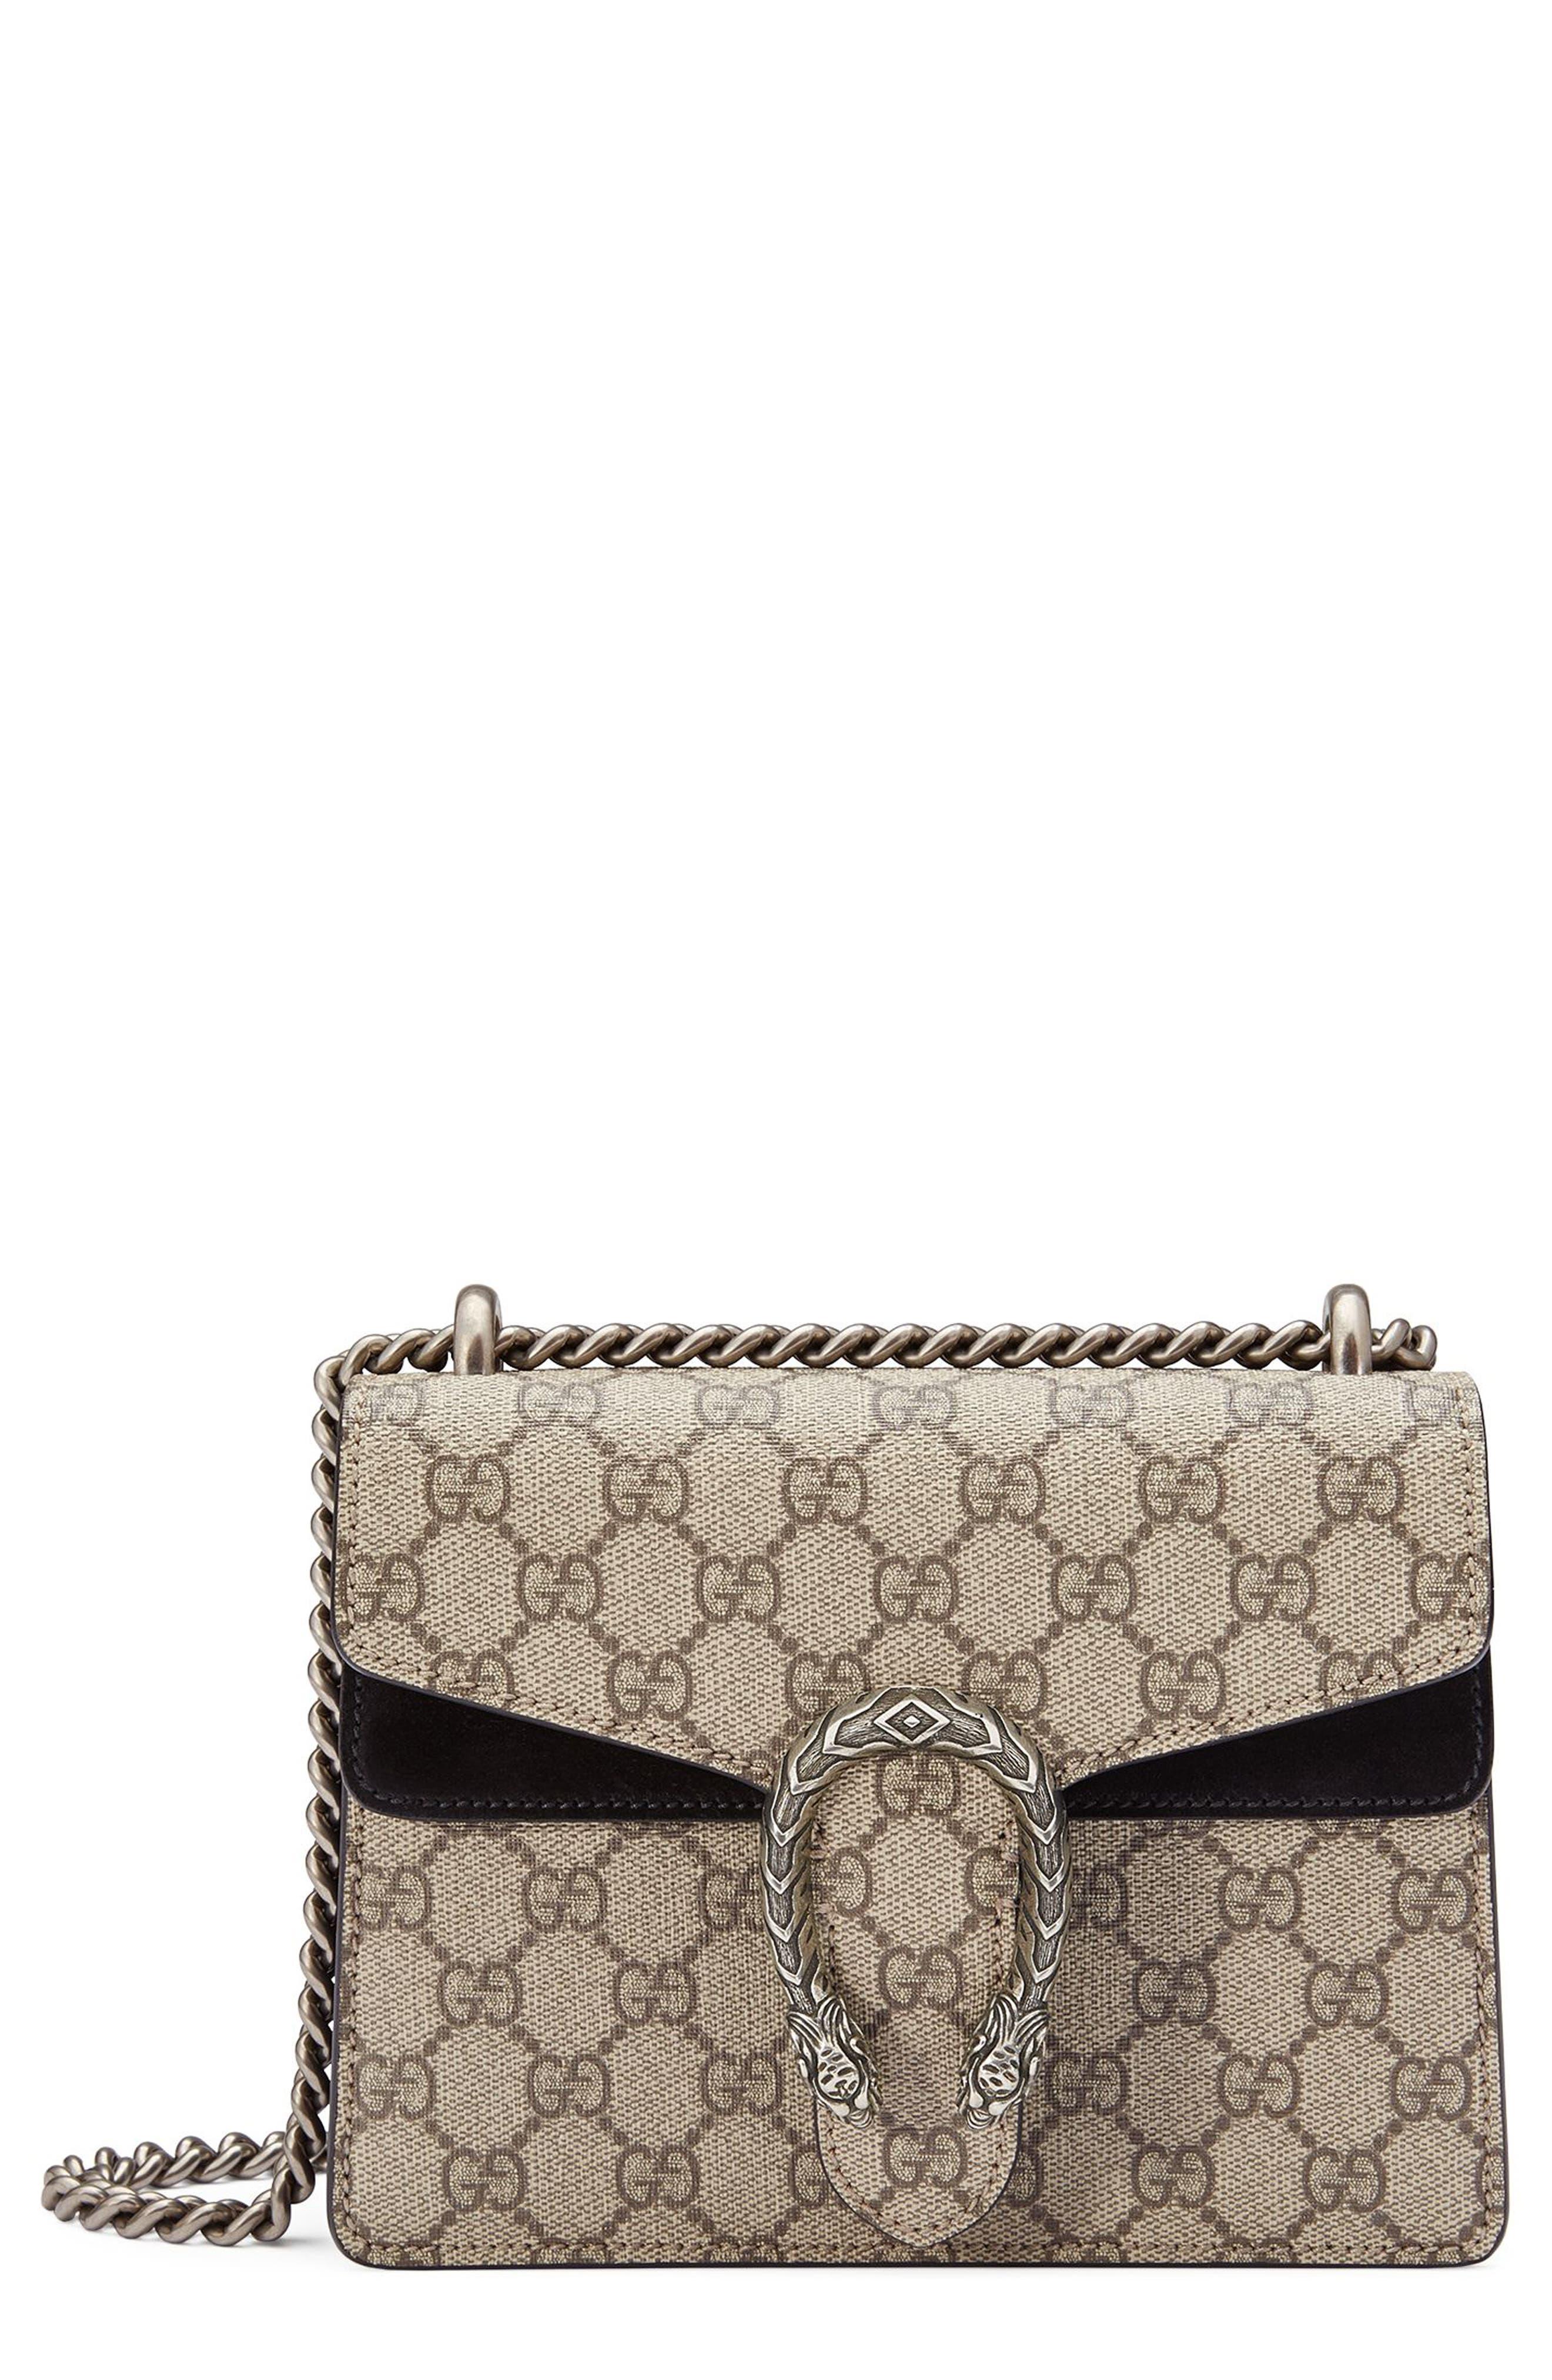 Mini Dionysus GG Supreme Shoulder Bag, Main, color, BEIGE EBONY/ NERO